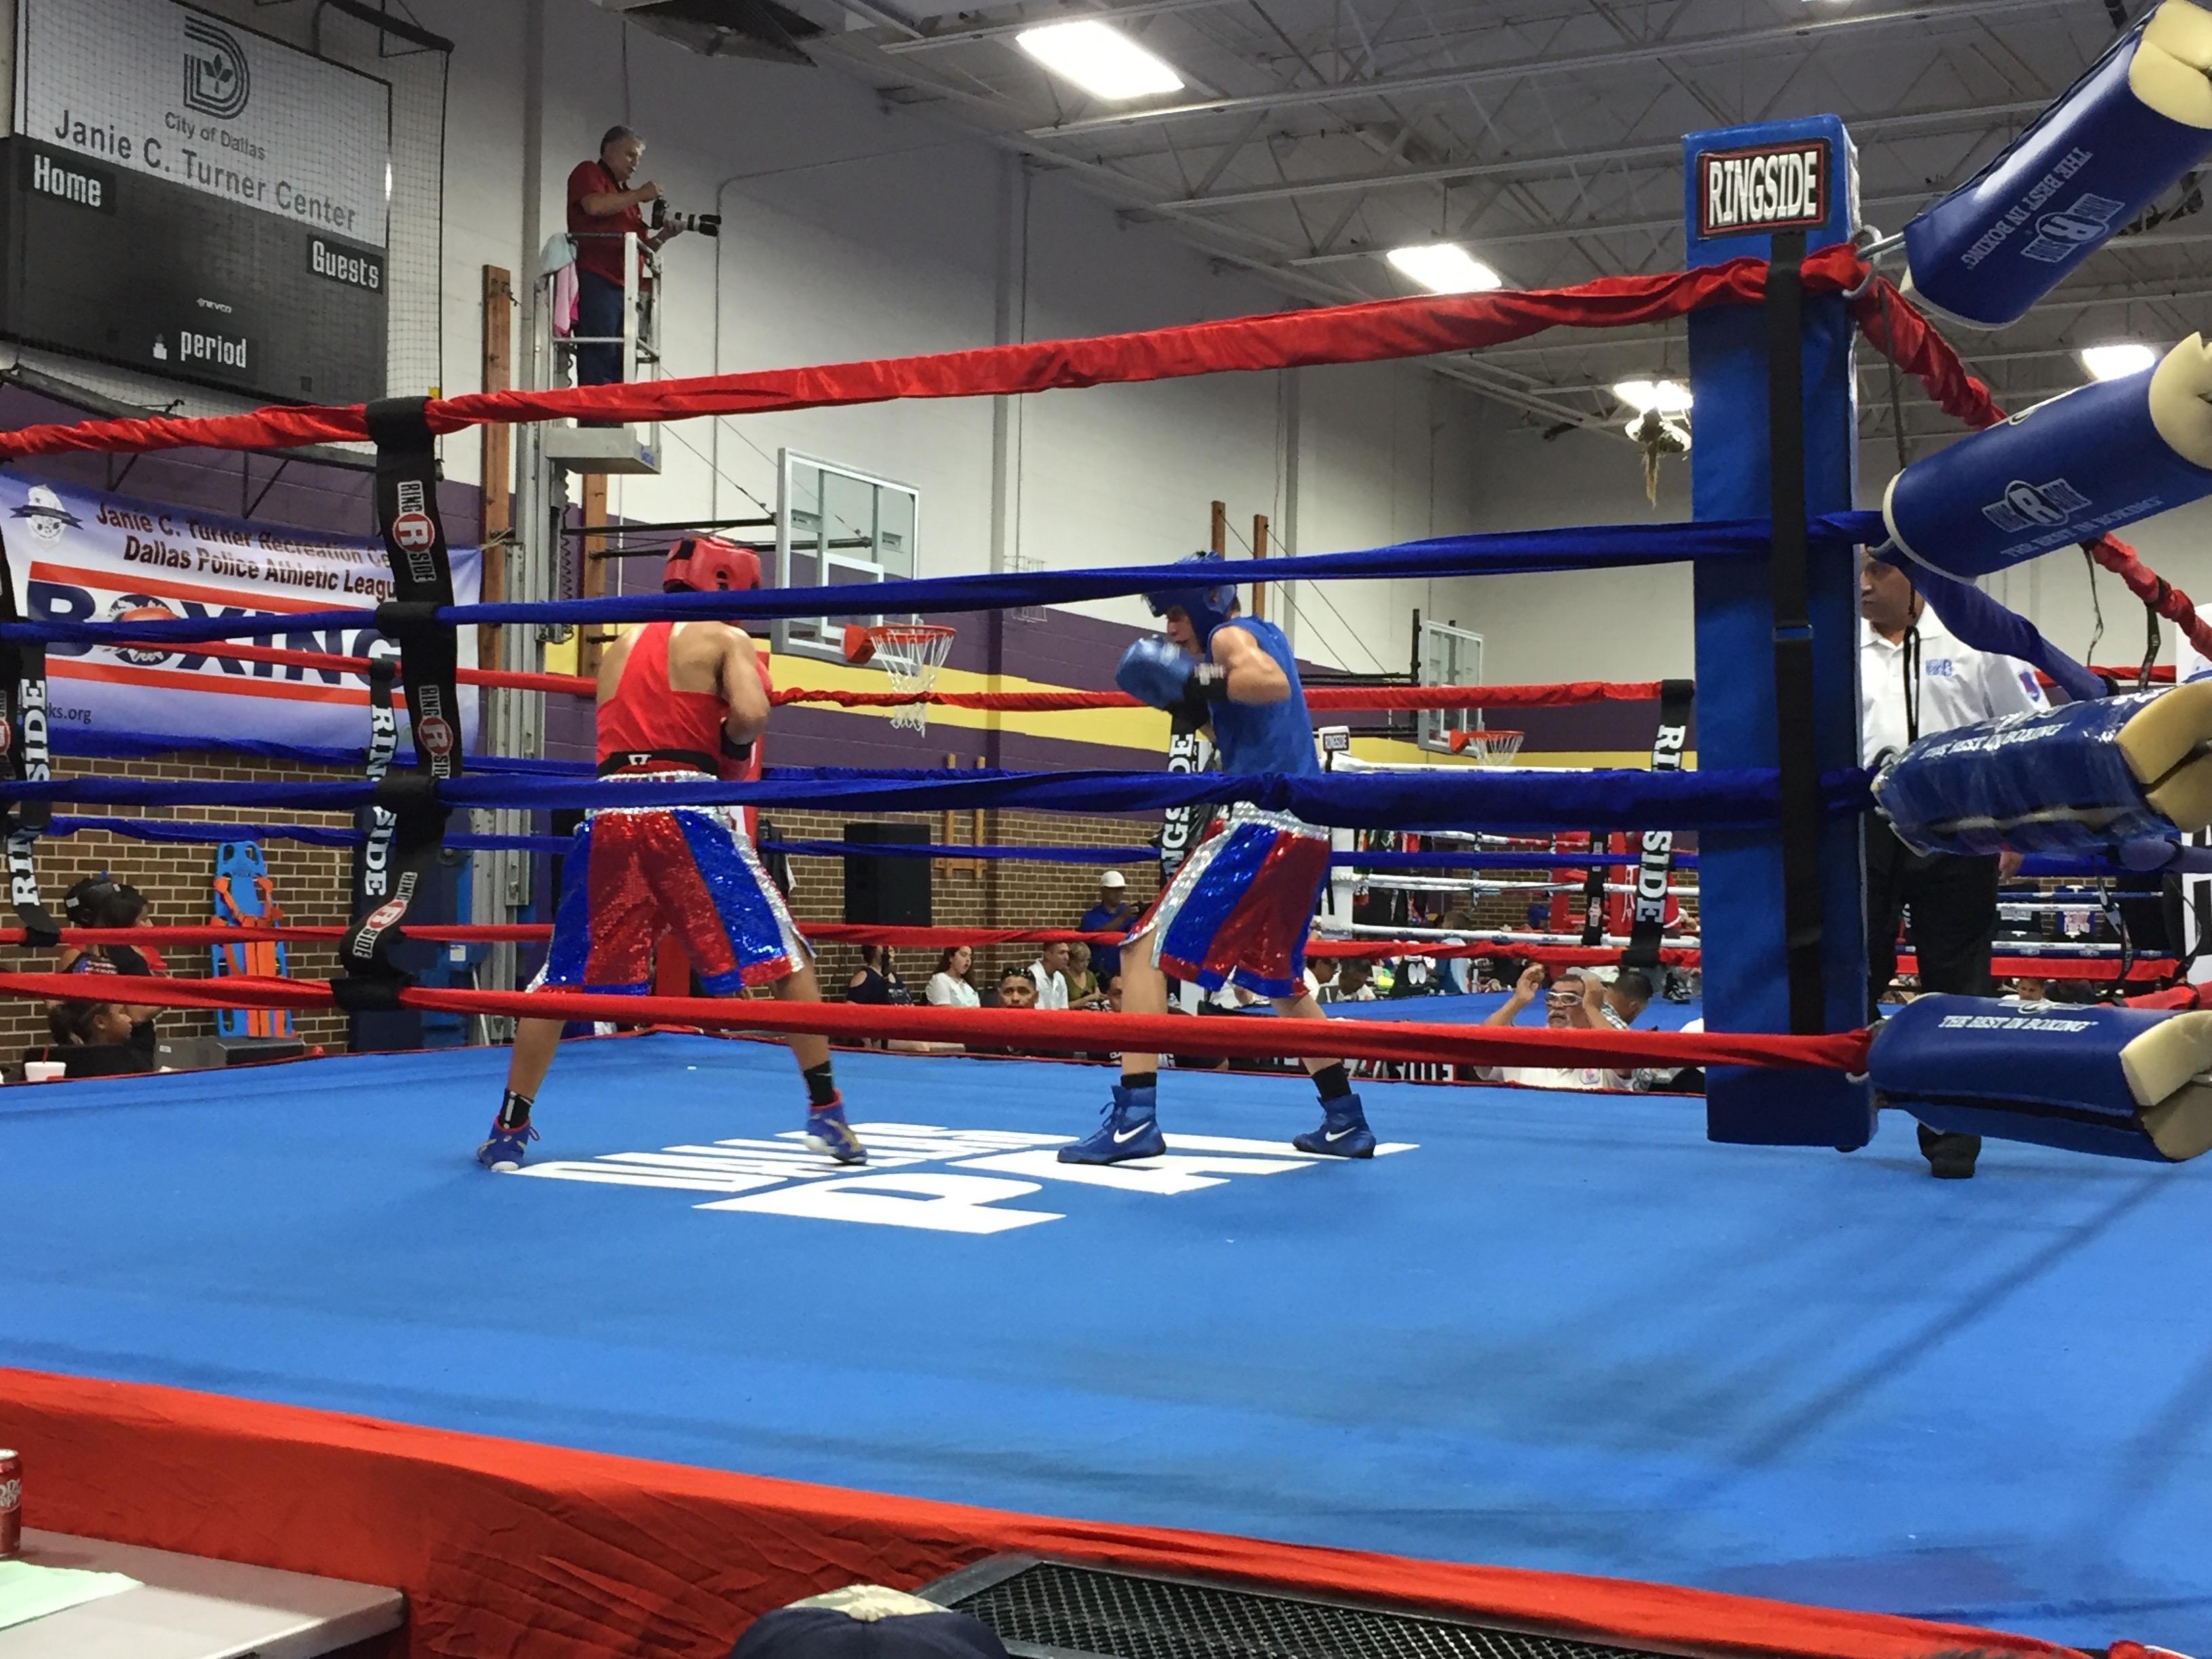 Boxing | Dallas Police Athletic League